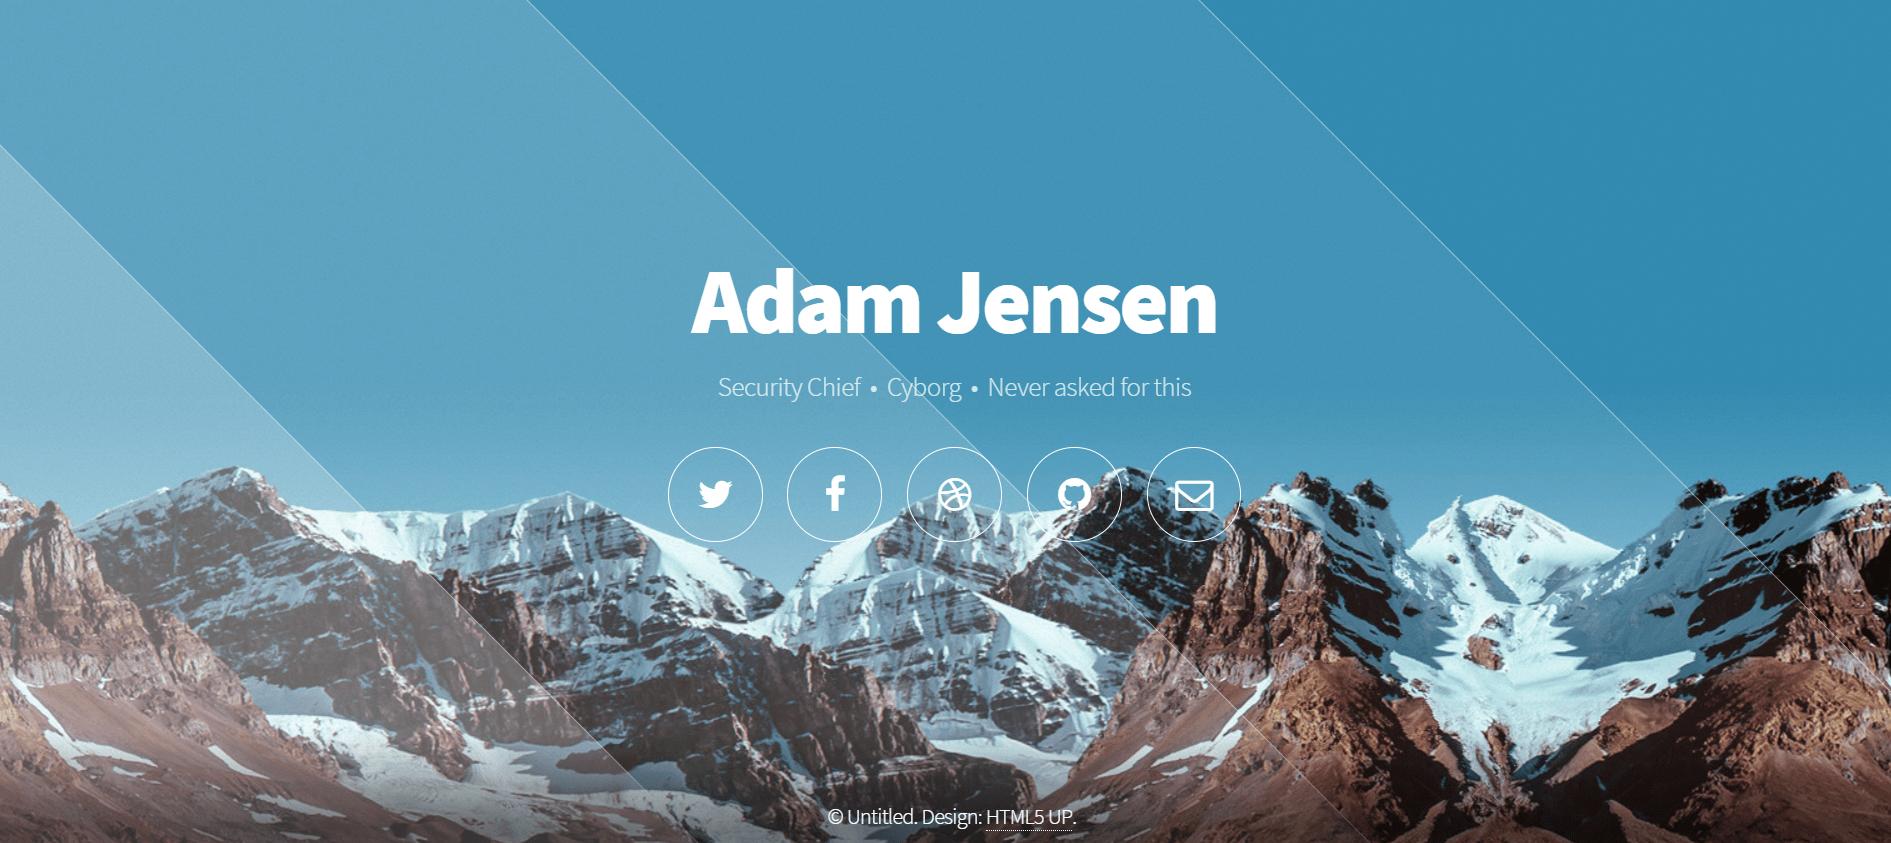 website design ideas - side scrolling image